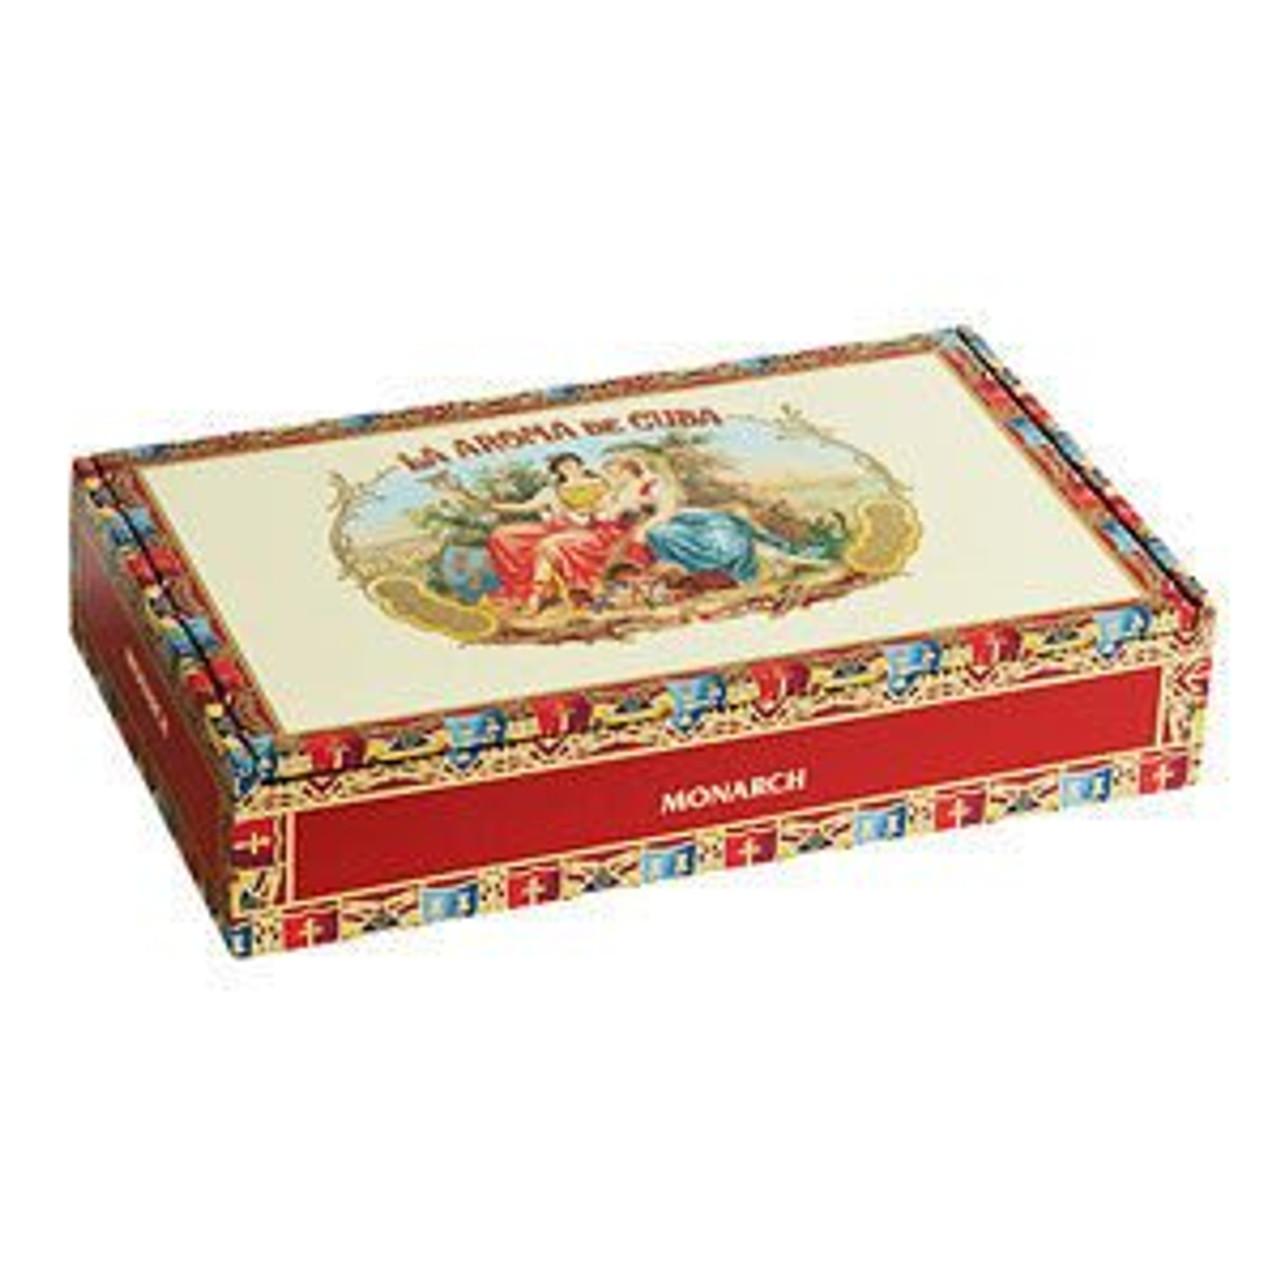 La Aroma de Cuba Corona Cigars - 5.5 x 44 (Box of 25)